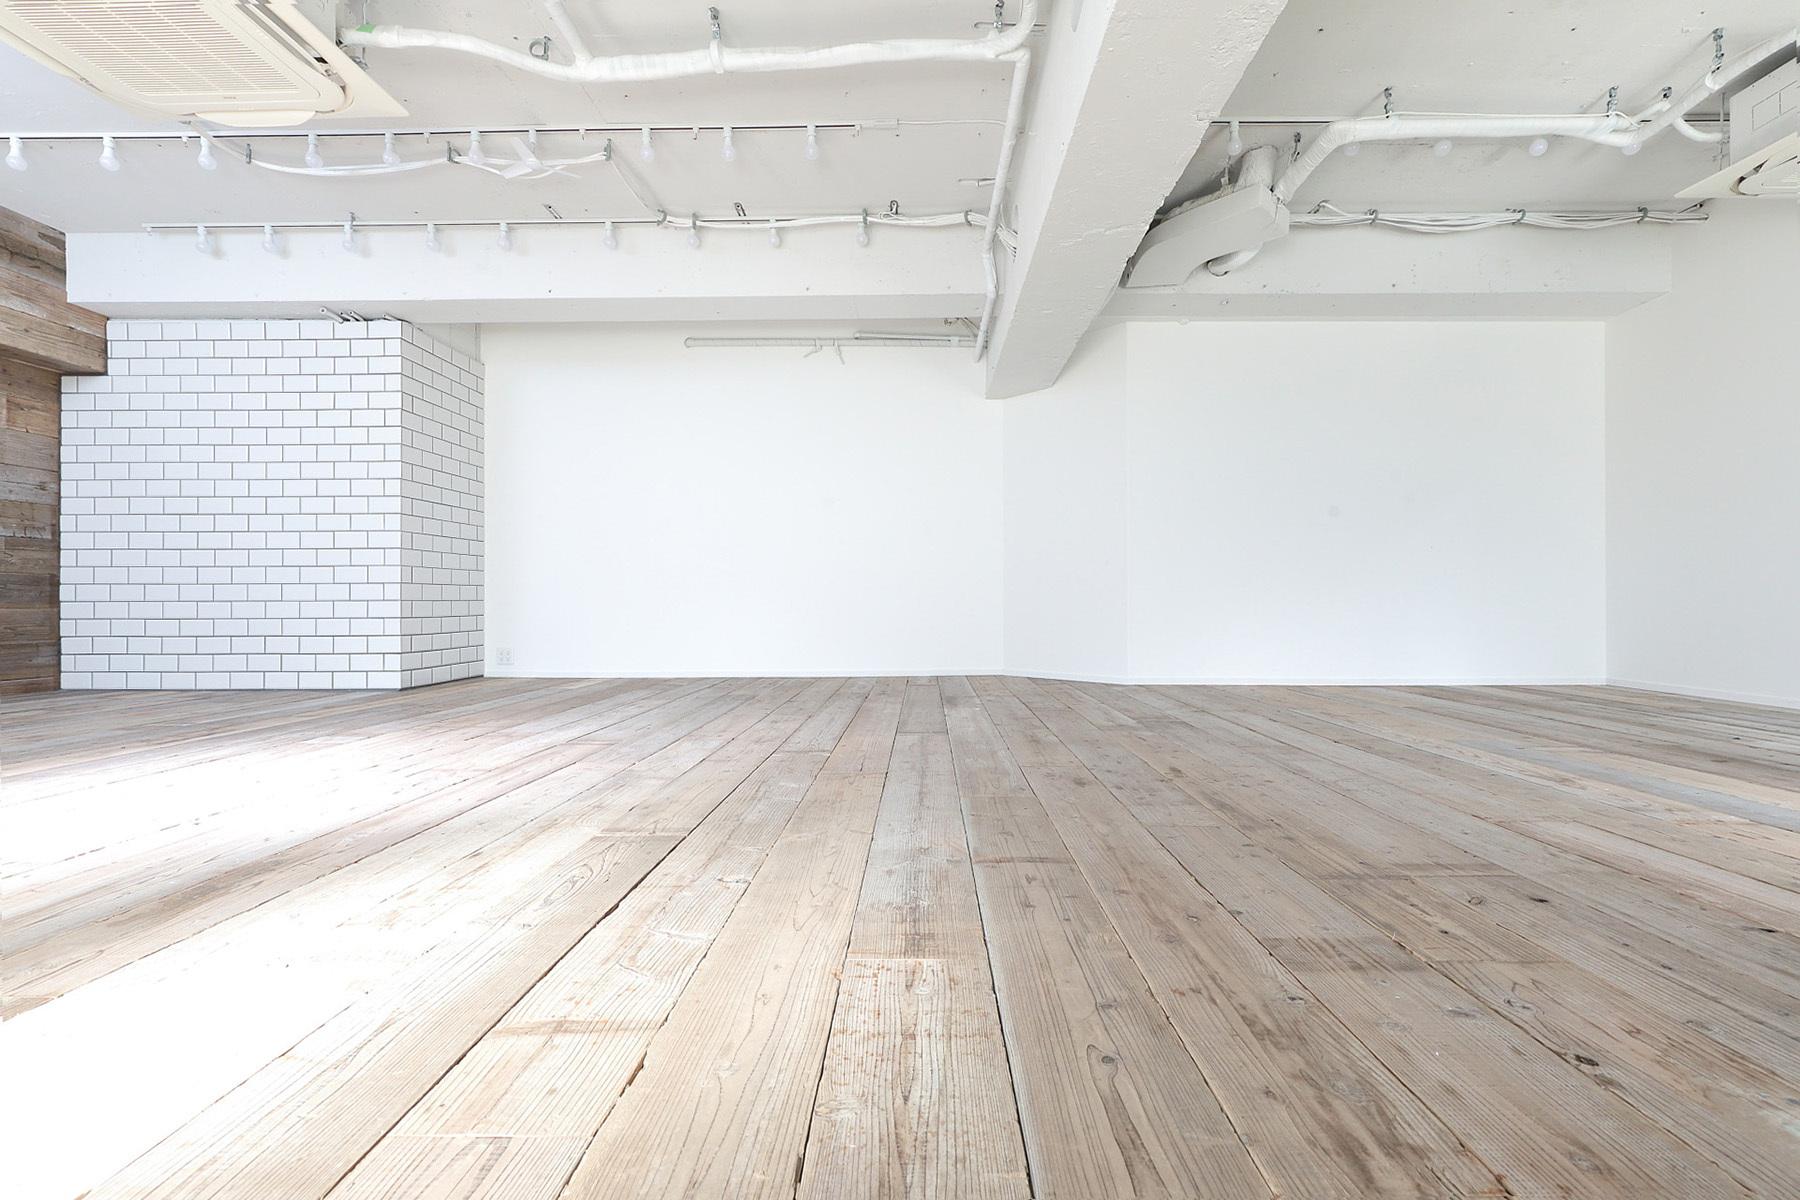 STUDIO FOXTAIL Bst (スタジオ フォックステイル Bst)最新のライブ配信用機材を完備